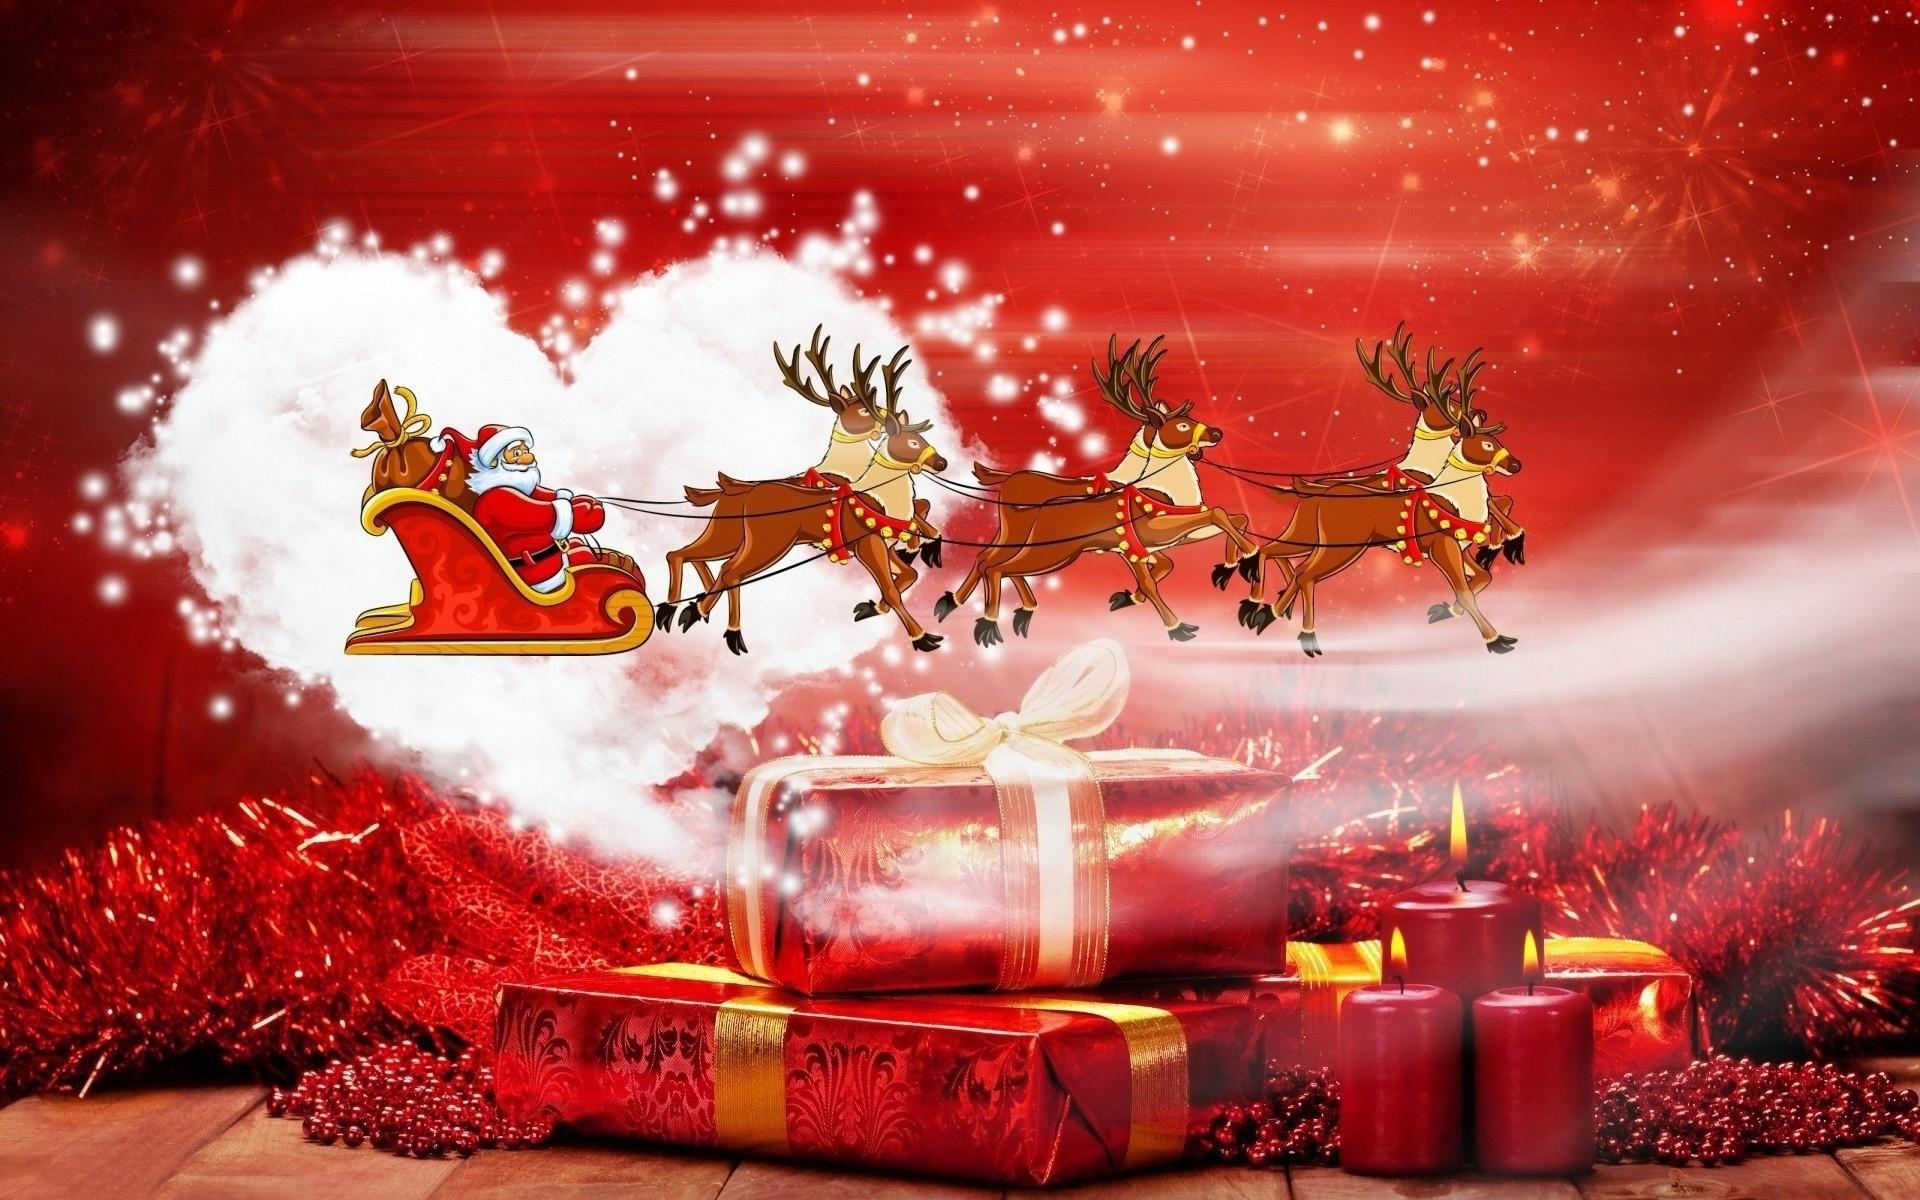 Santa Claus HD Wallpaper 1920×1080 Santa Claus HD Wallpaper 1920×1200